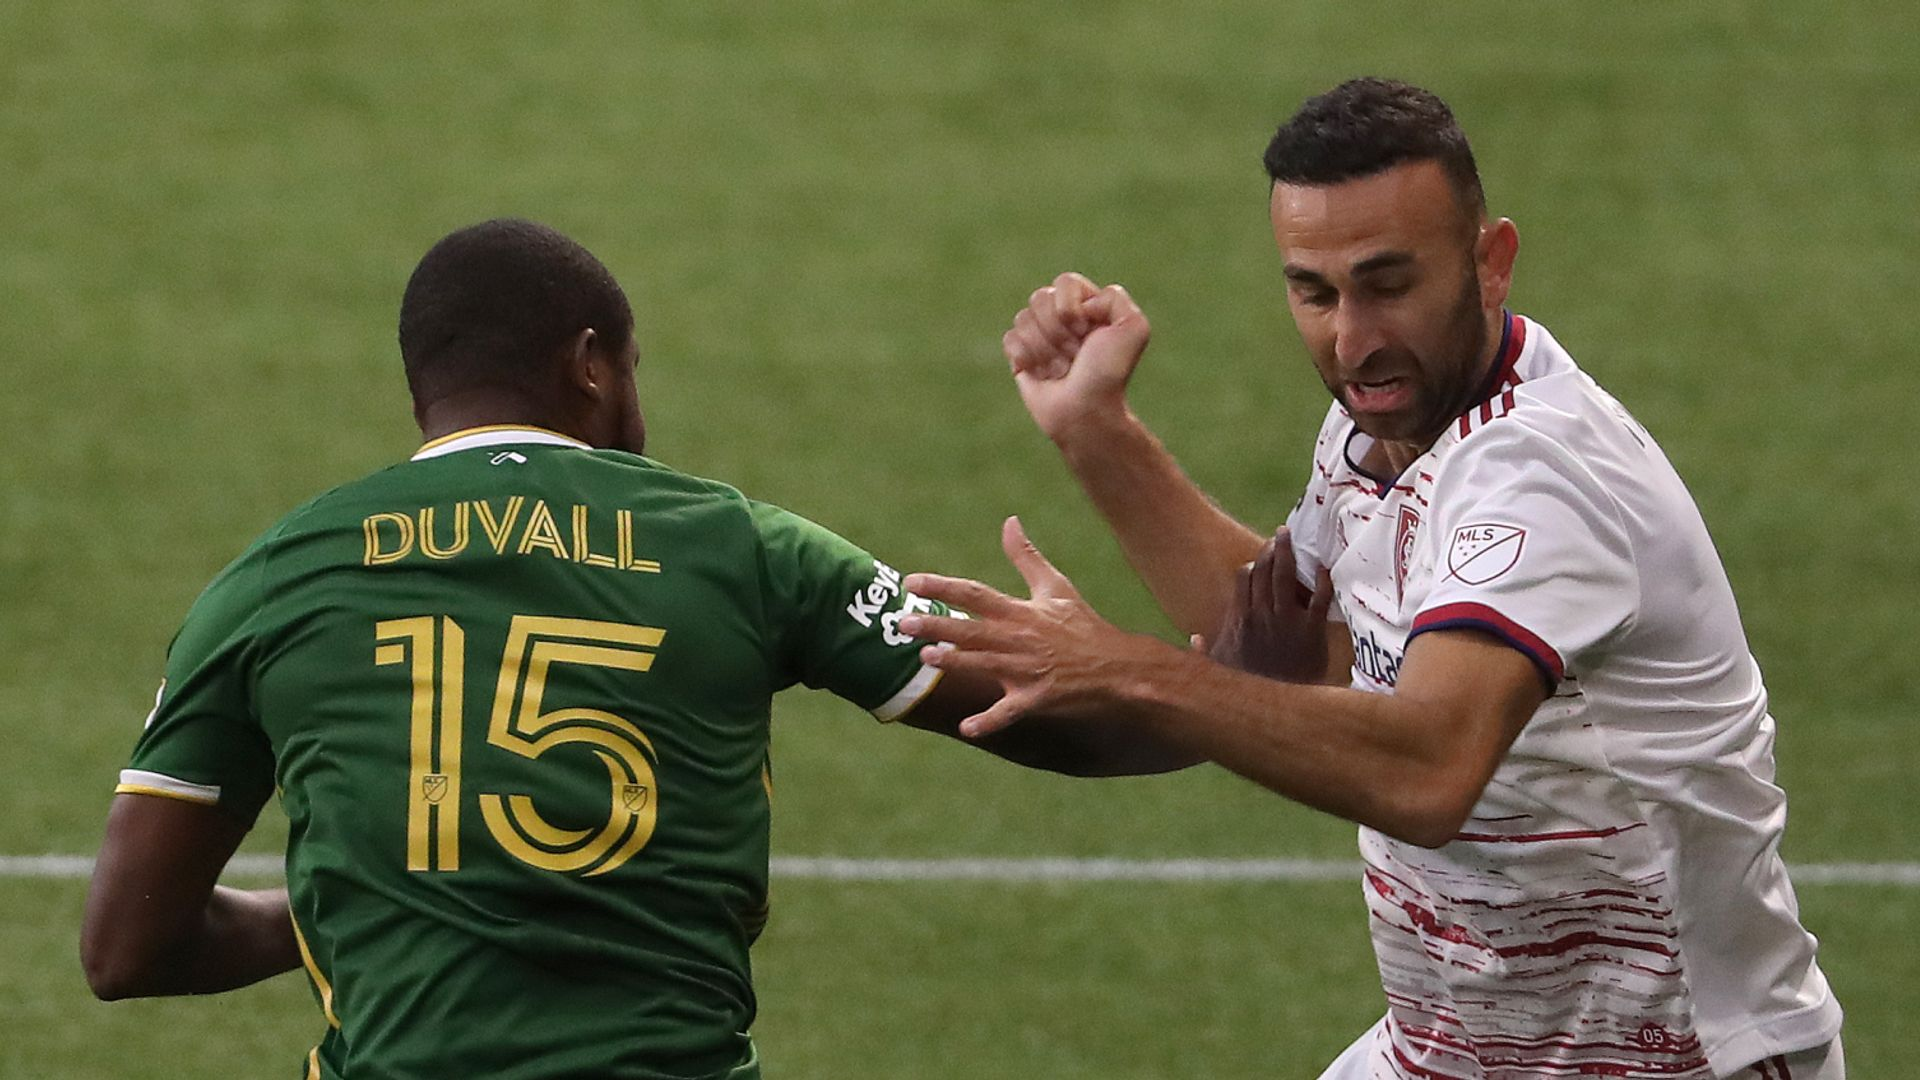 MLS: Late Salt Lake comeback in 4-4 thriller